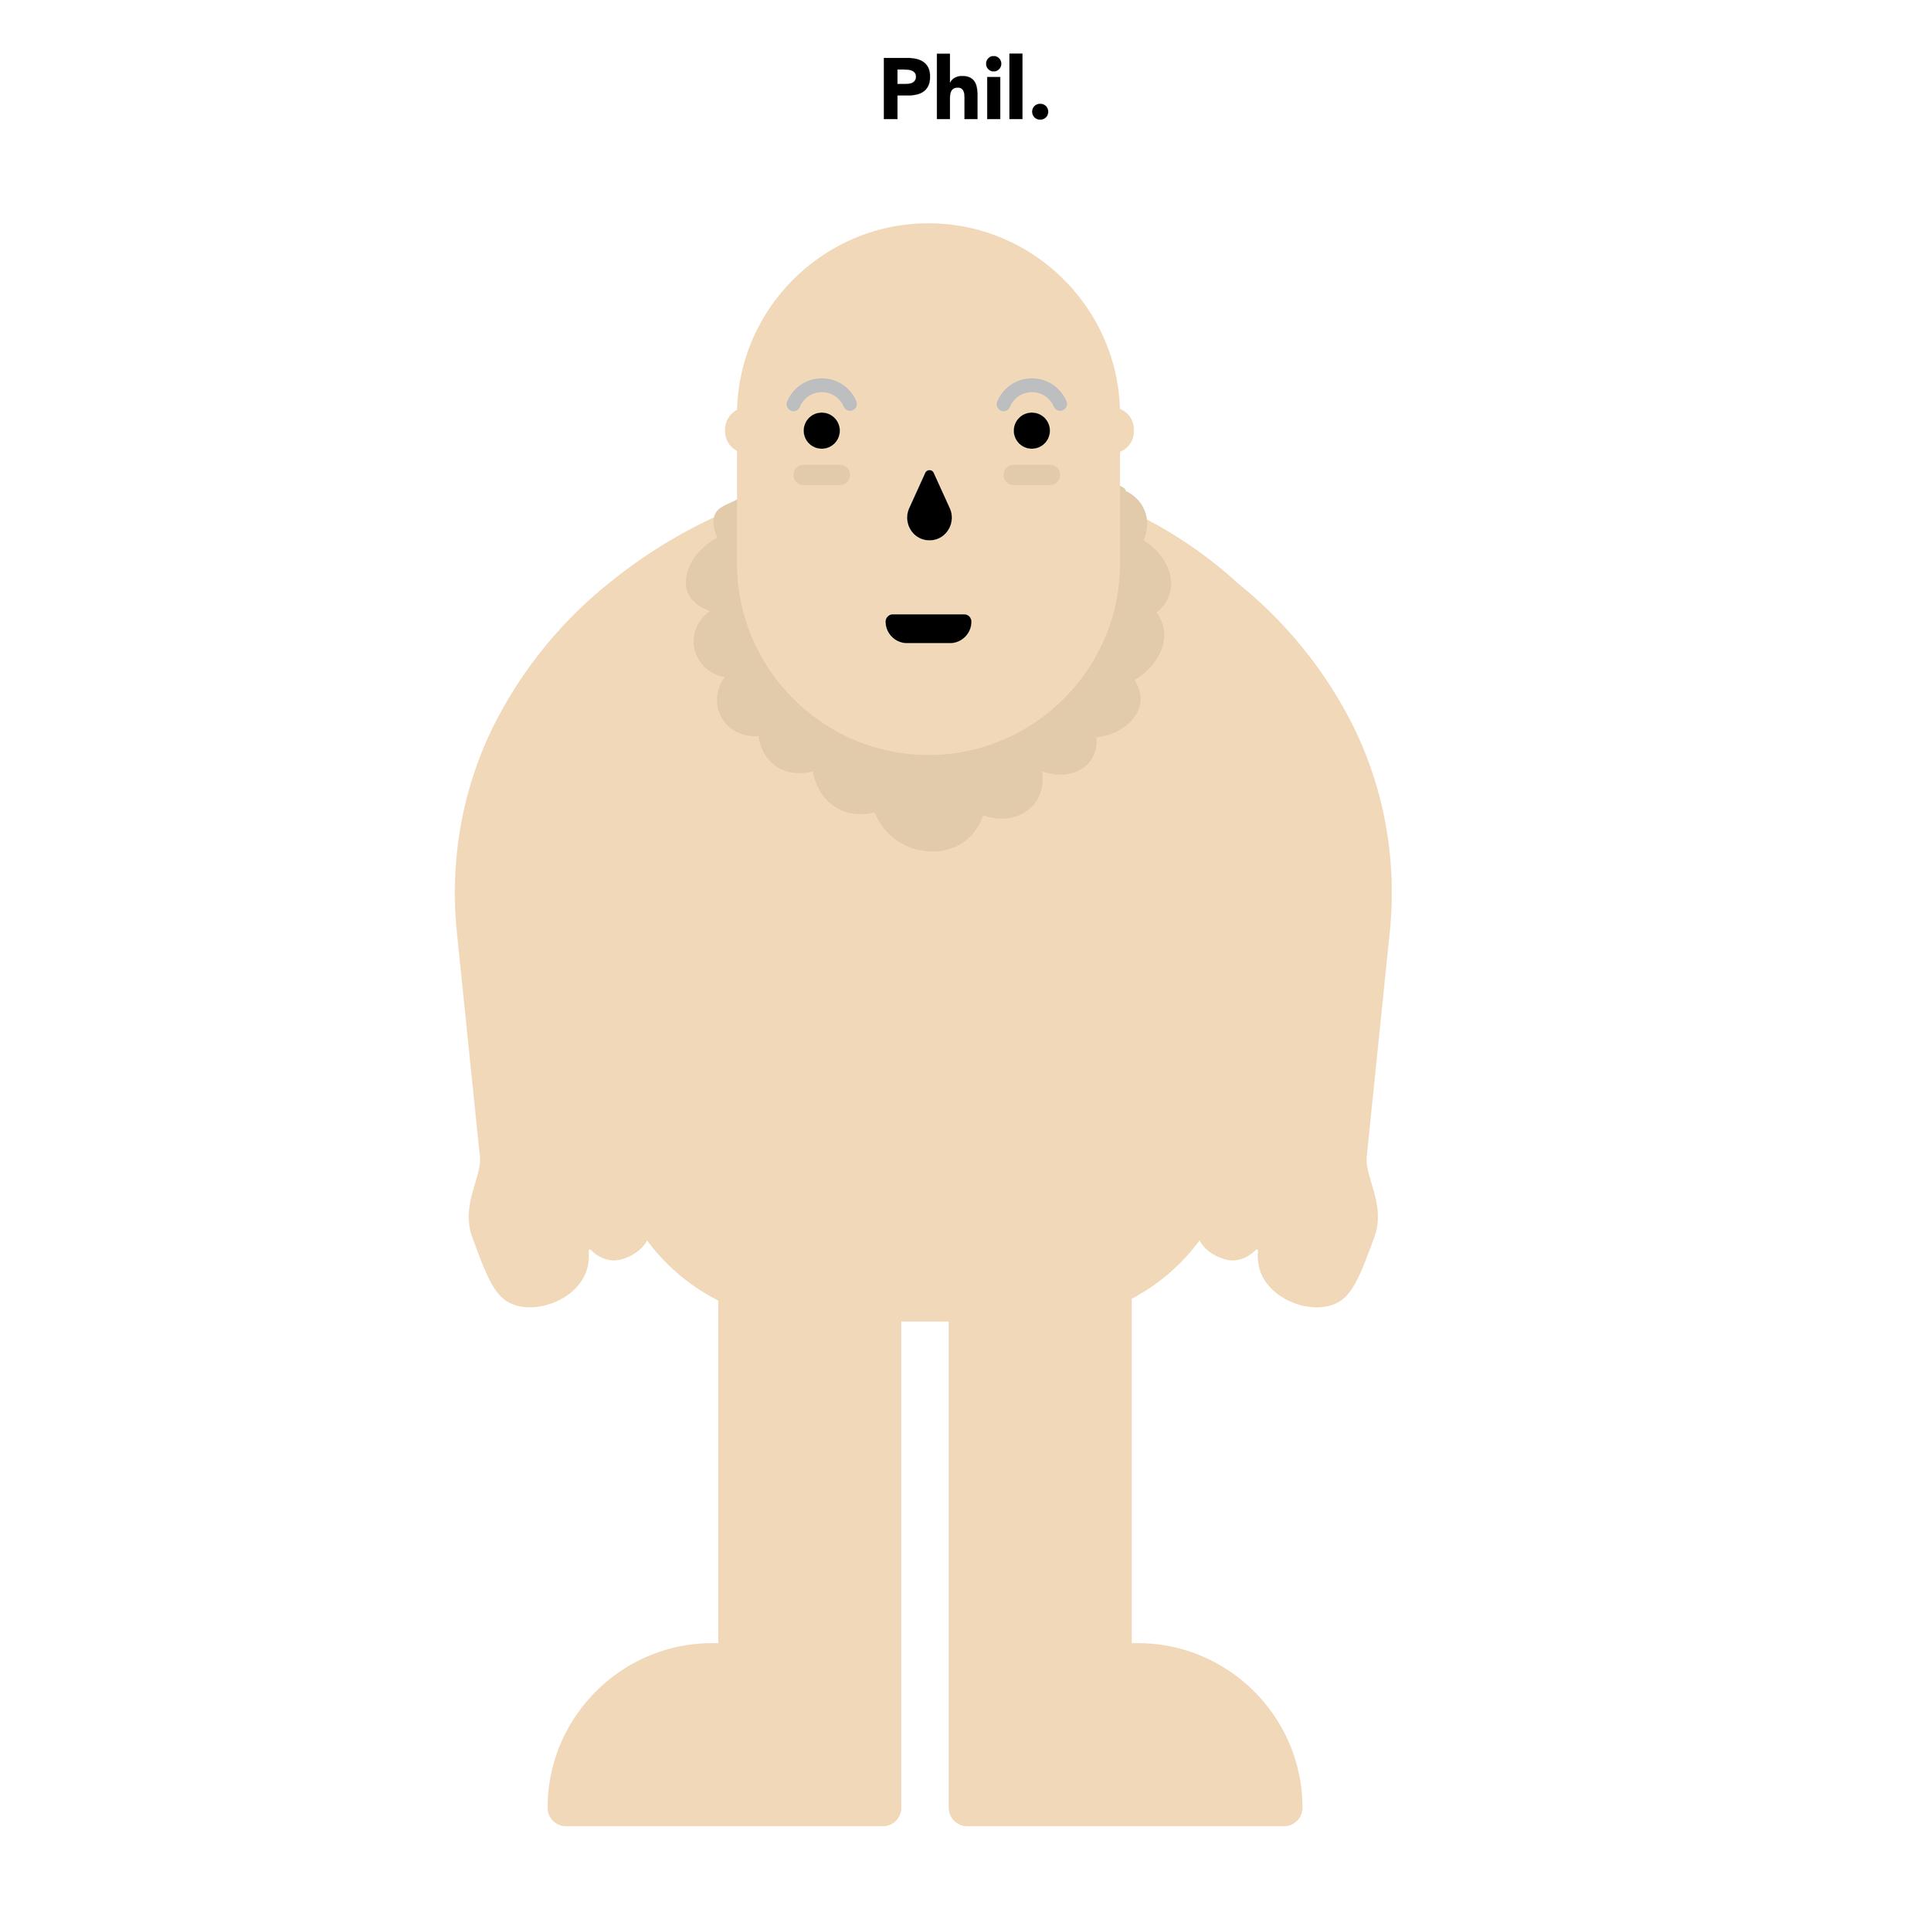 phil2-06.png